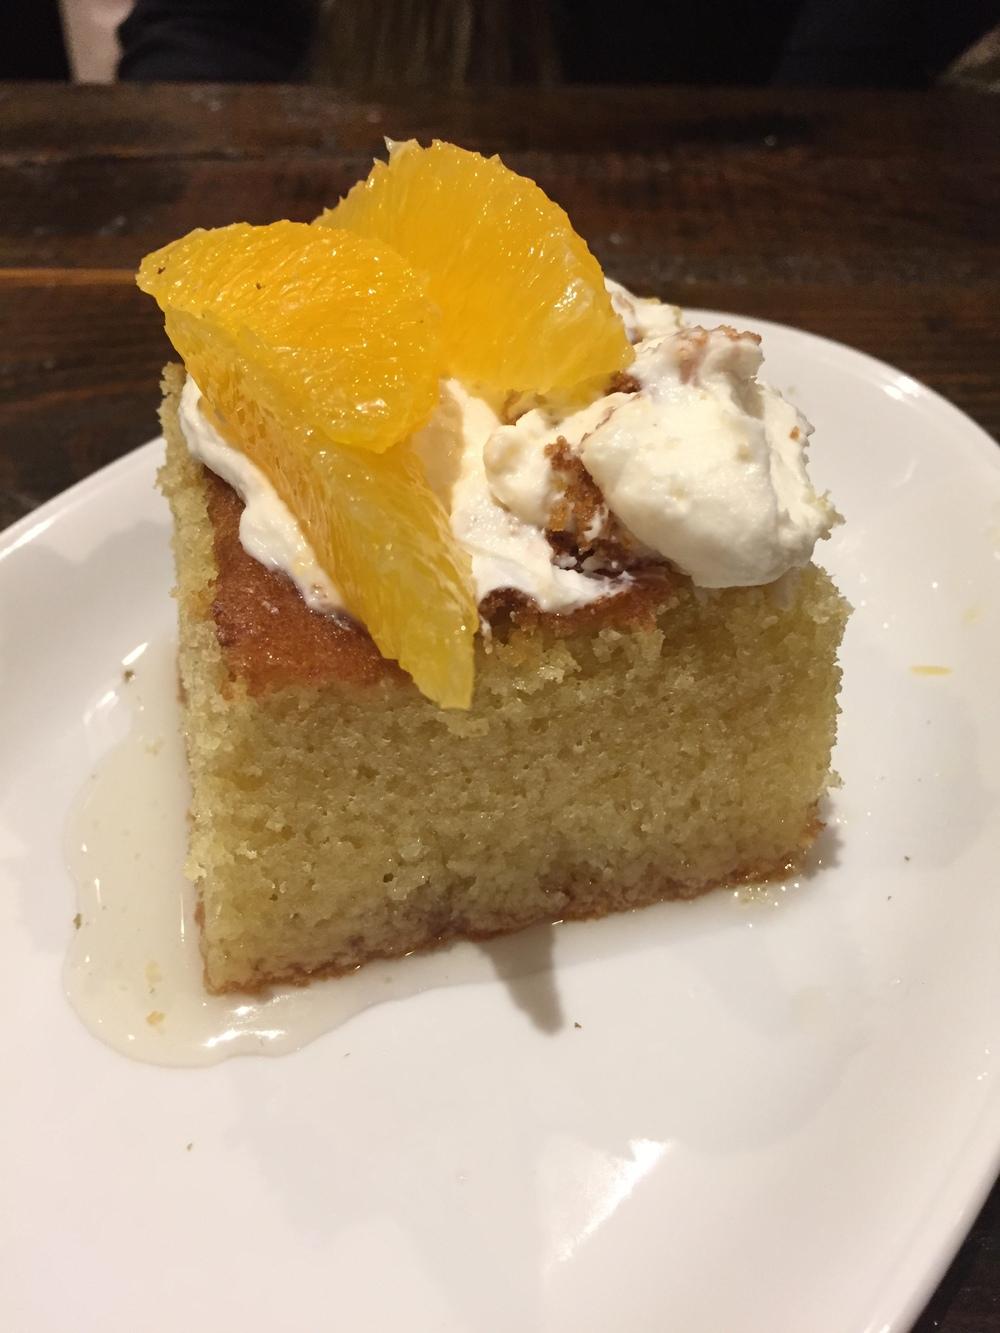 Sponge Cakey Cake